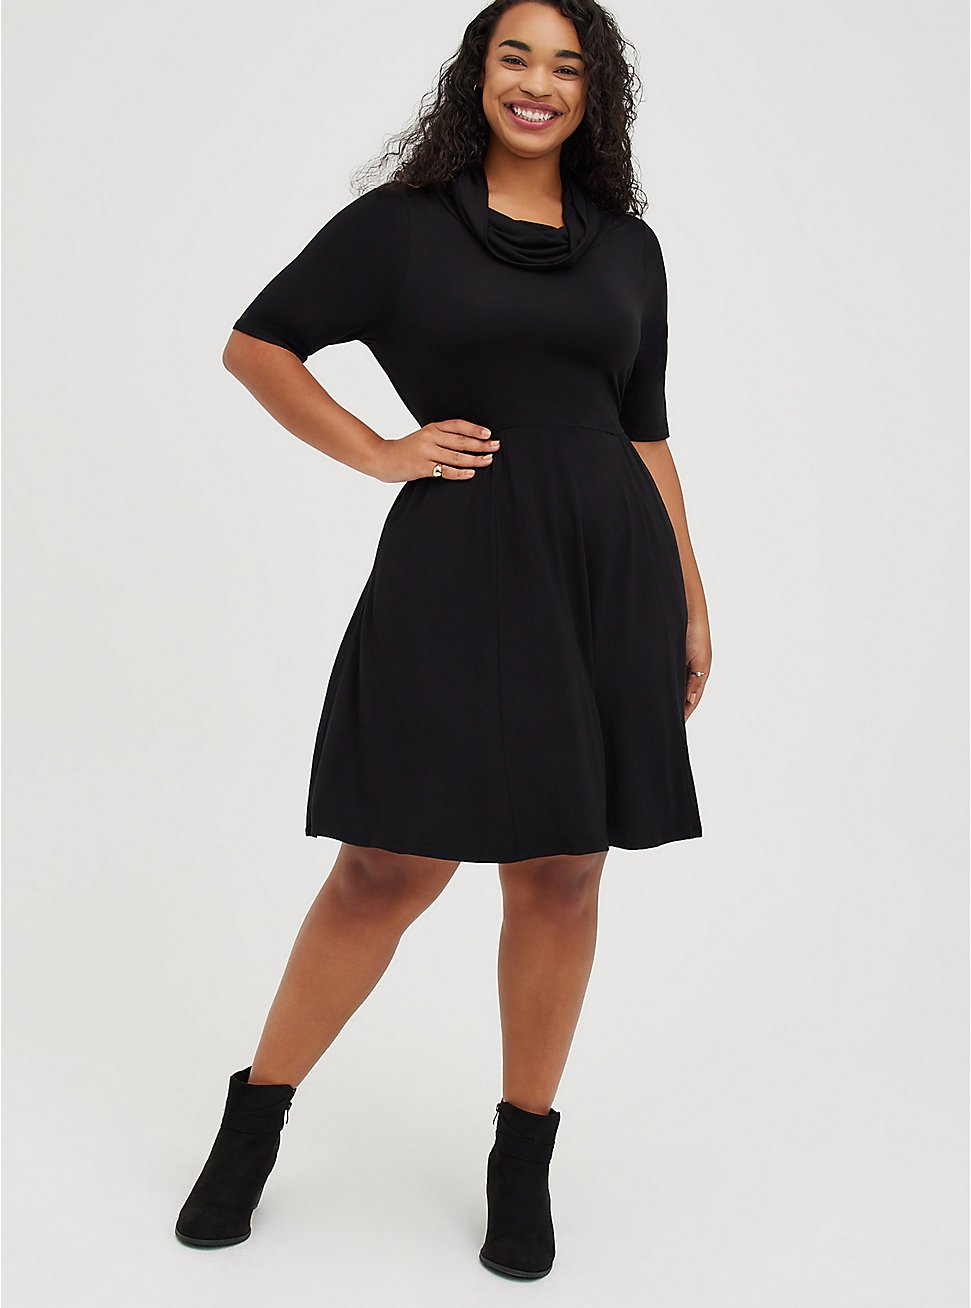 Plus Size Cowl Neck Skater Dress - Super Soft Black, DEEP BLACK, hi-res